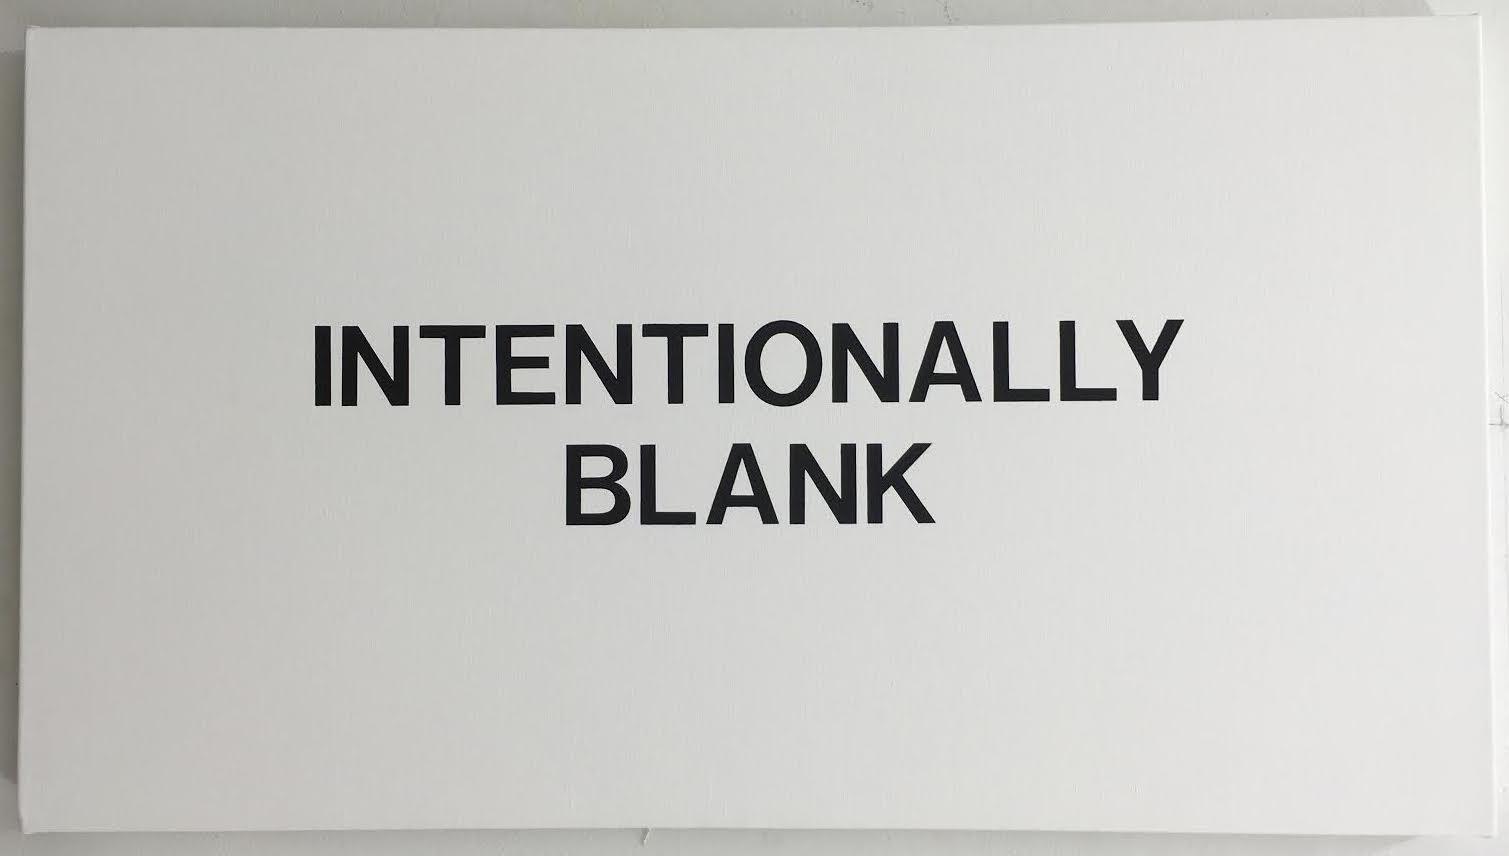 Rachel Hecker, Intentionally blank #2, 2016, acrylic on canvas, 20 x 36 inches